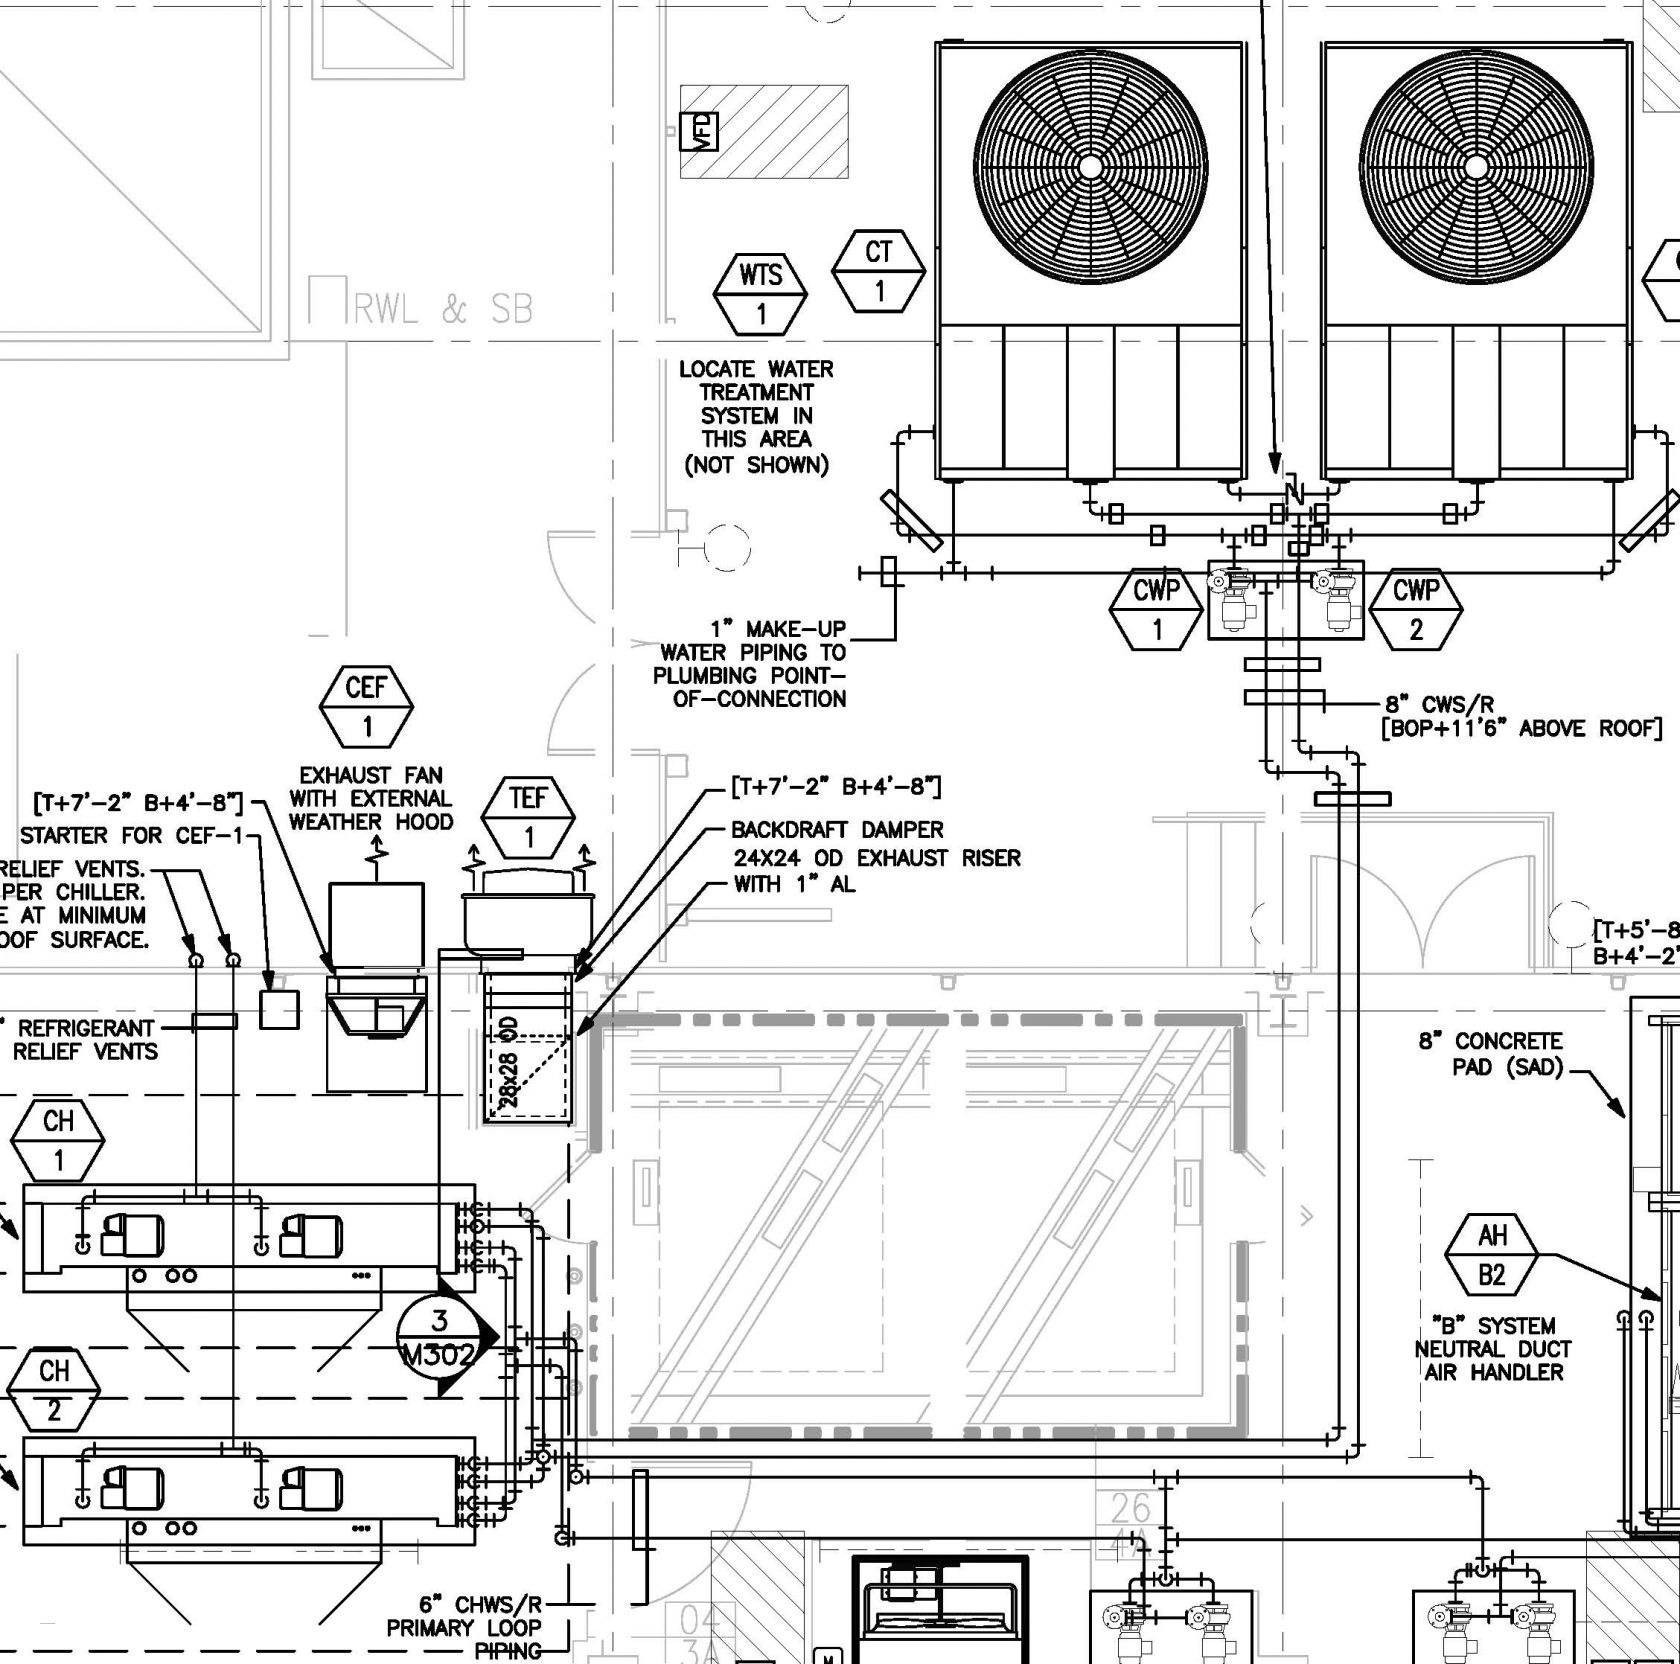 Reliance Transfer Switch Wiring Diagram Generator Transfer Box Wiring Diagram Expert Schematics Diagram Of Reliance Transfer Switch Wiring Diagram Wiring Diagram Changeover Switch Generator Fresh Generator Automatic